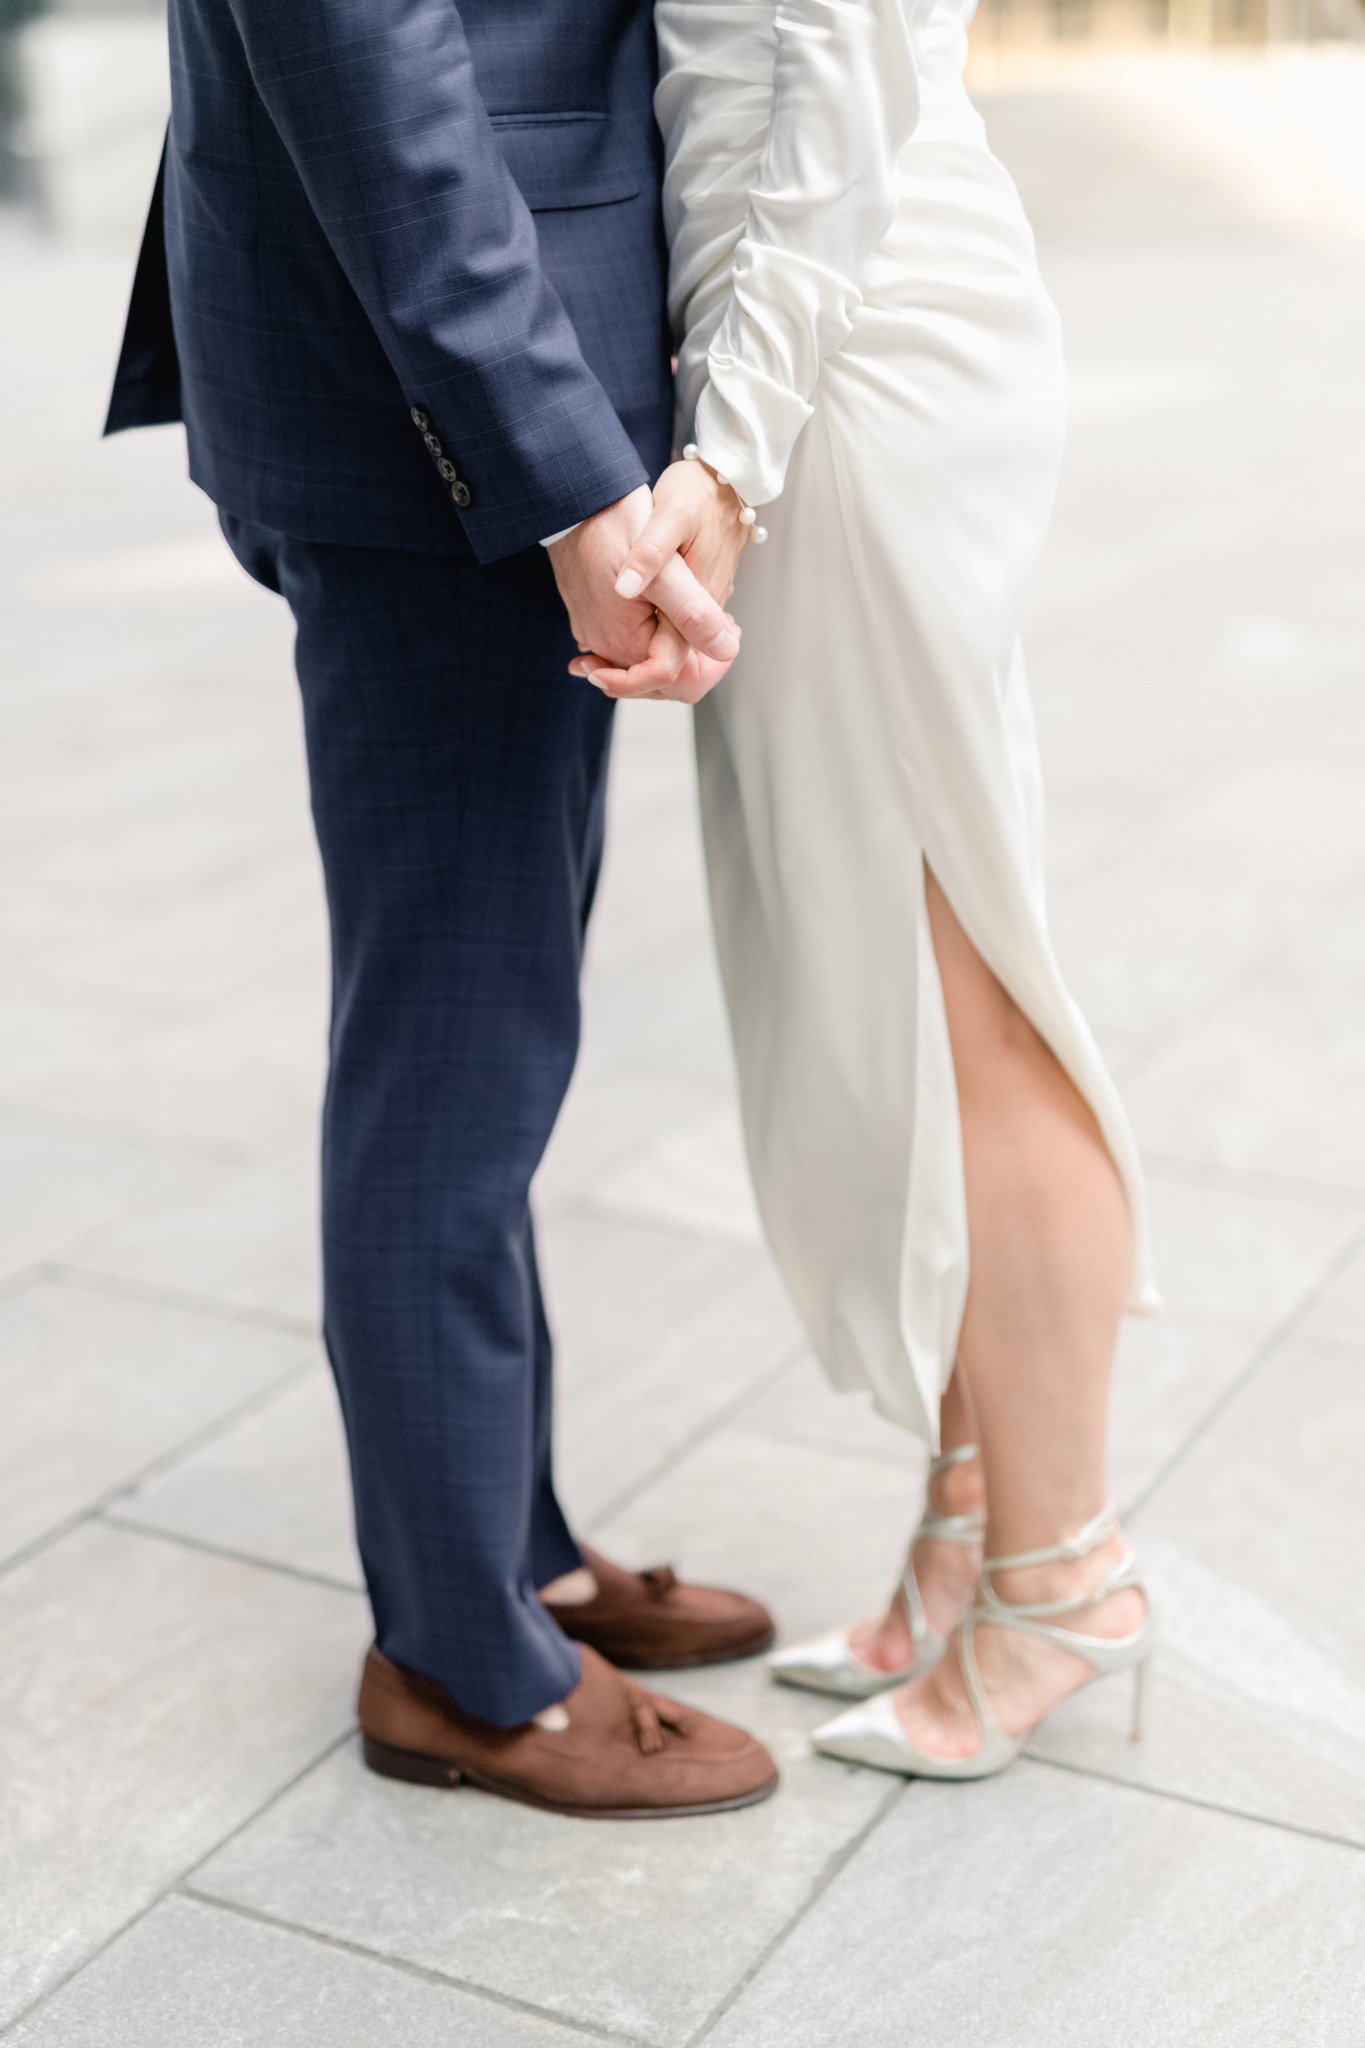 nyc engagement photos_nyc elopement_ct wedding photographer-1.jpg